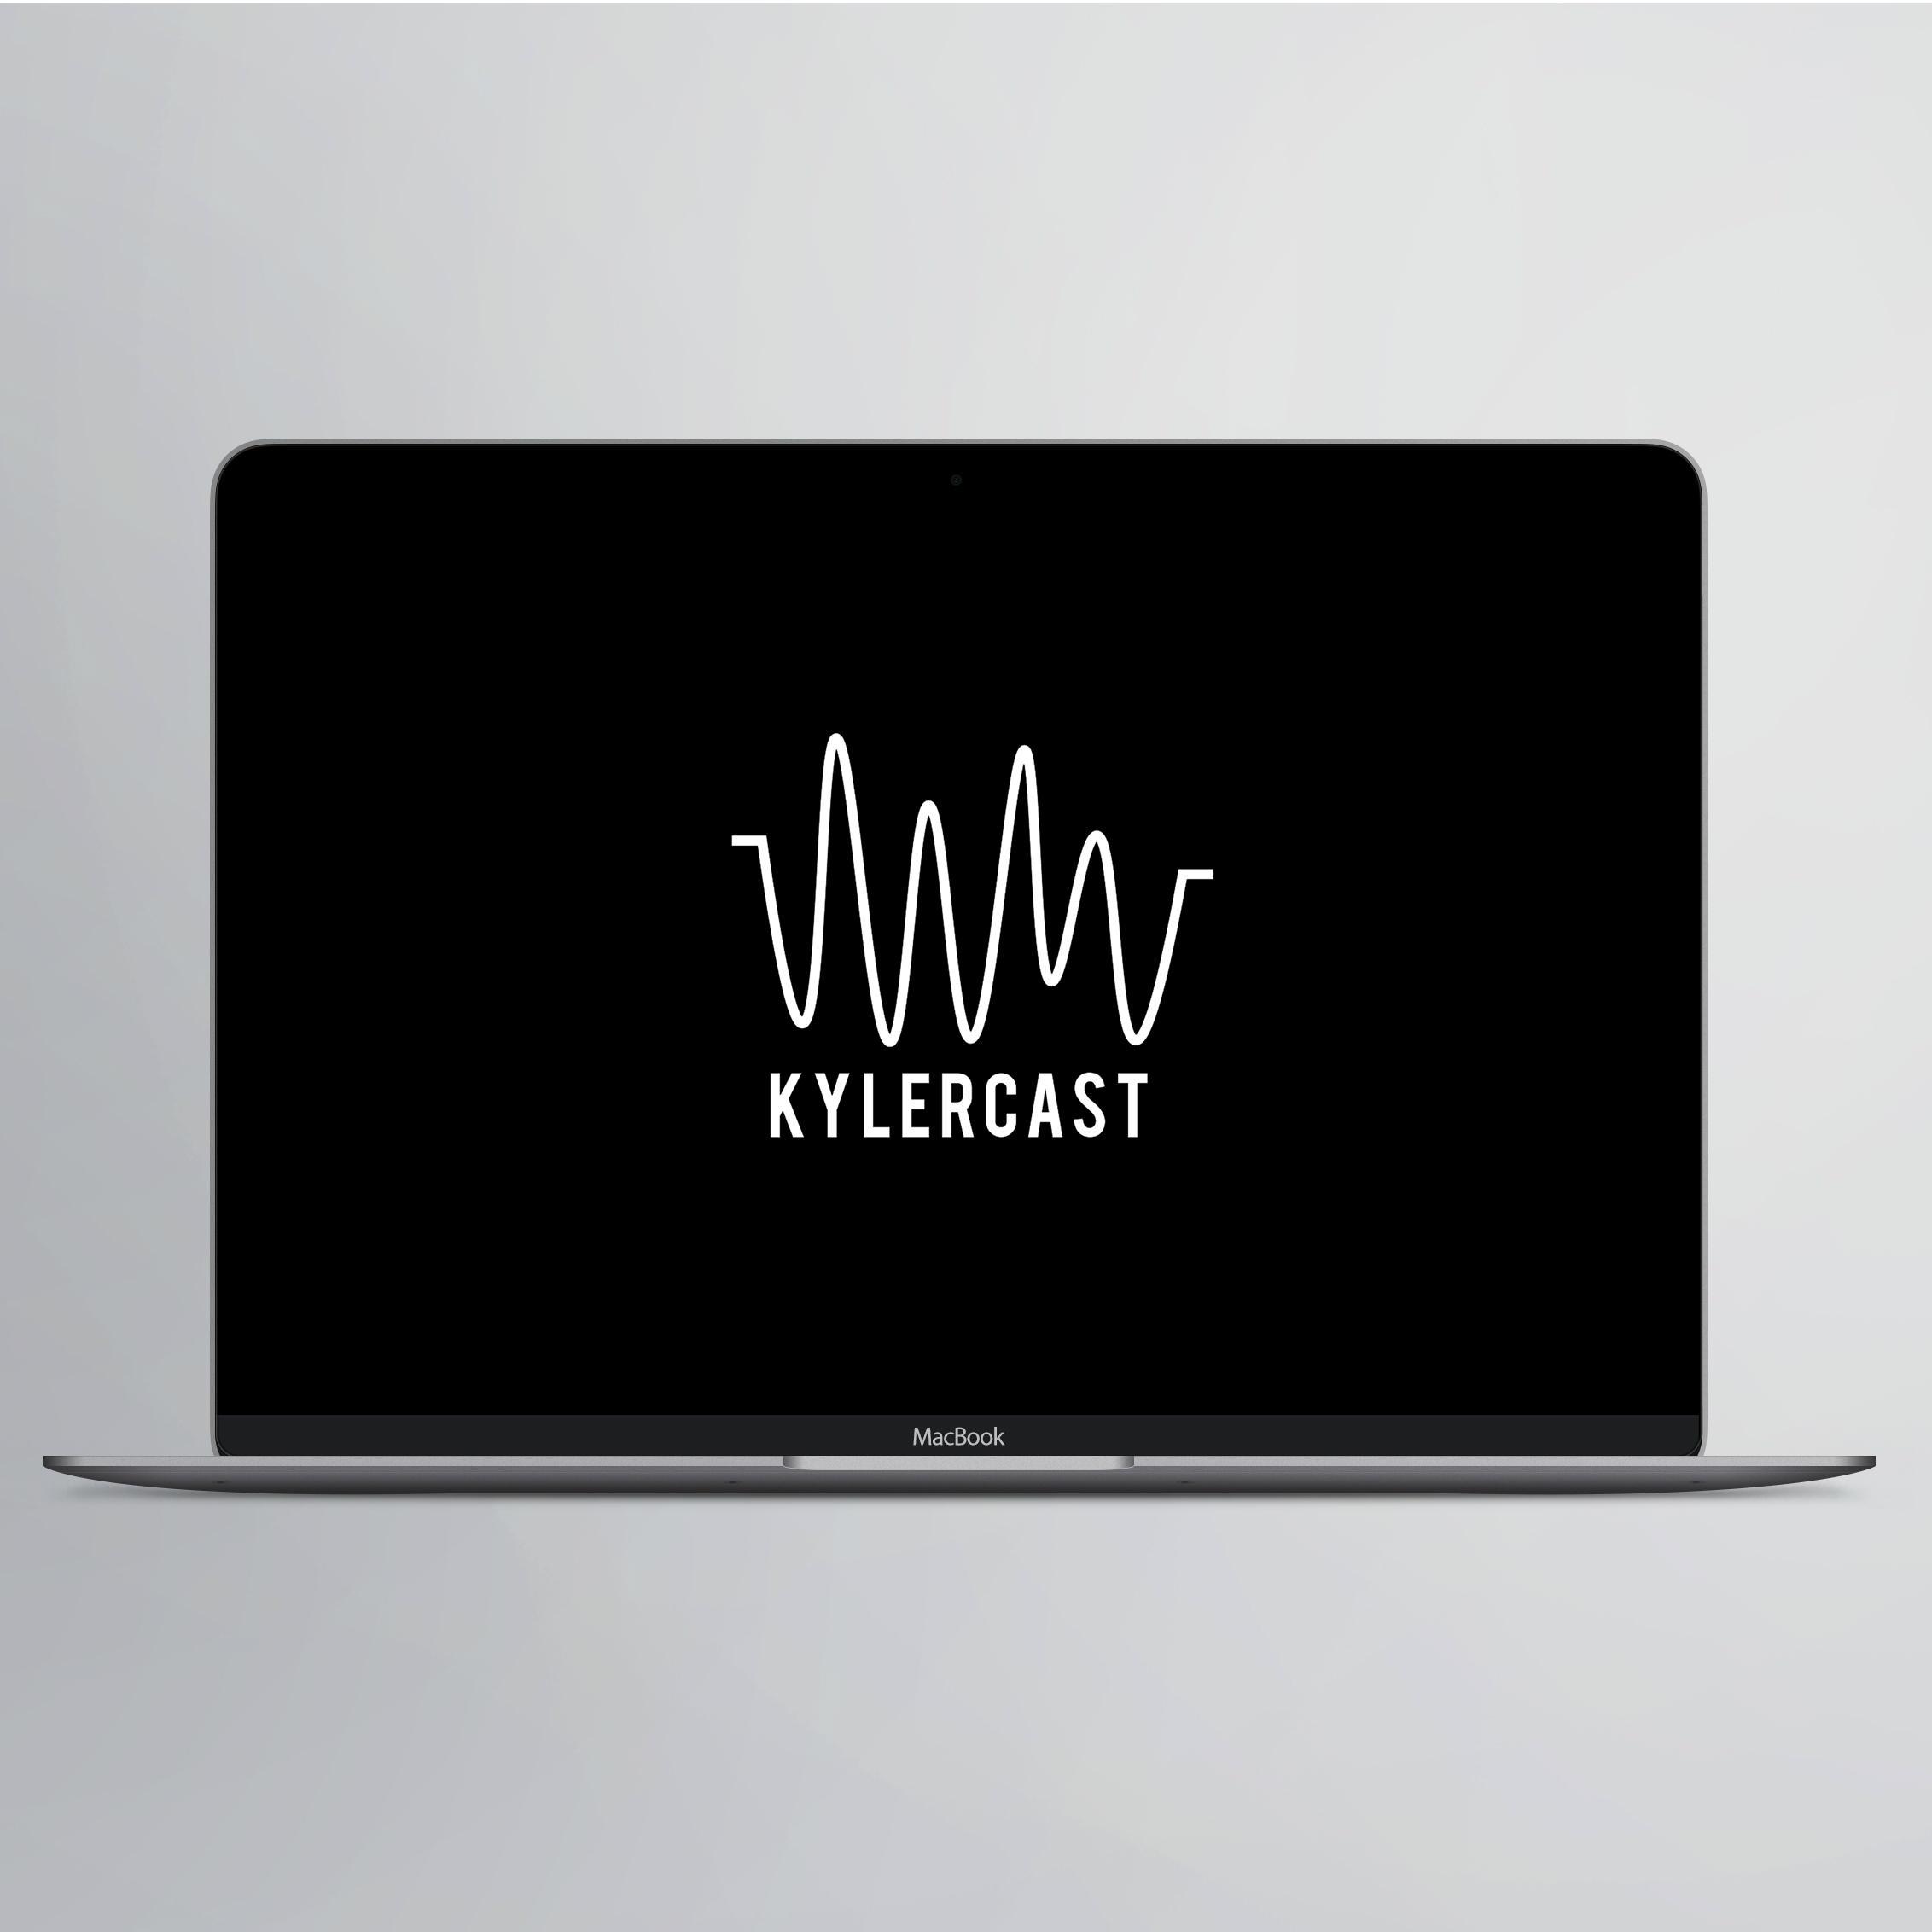 Kylercast logo design